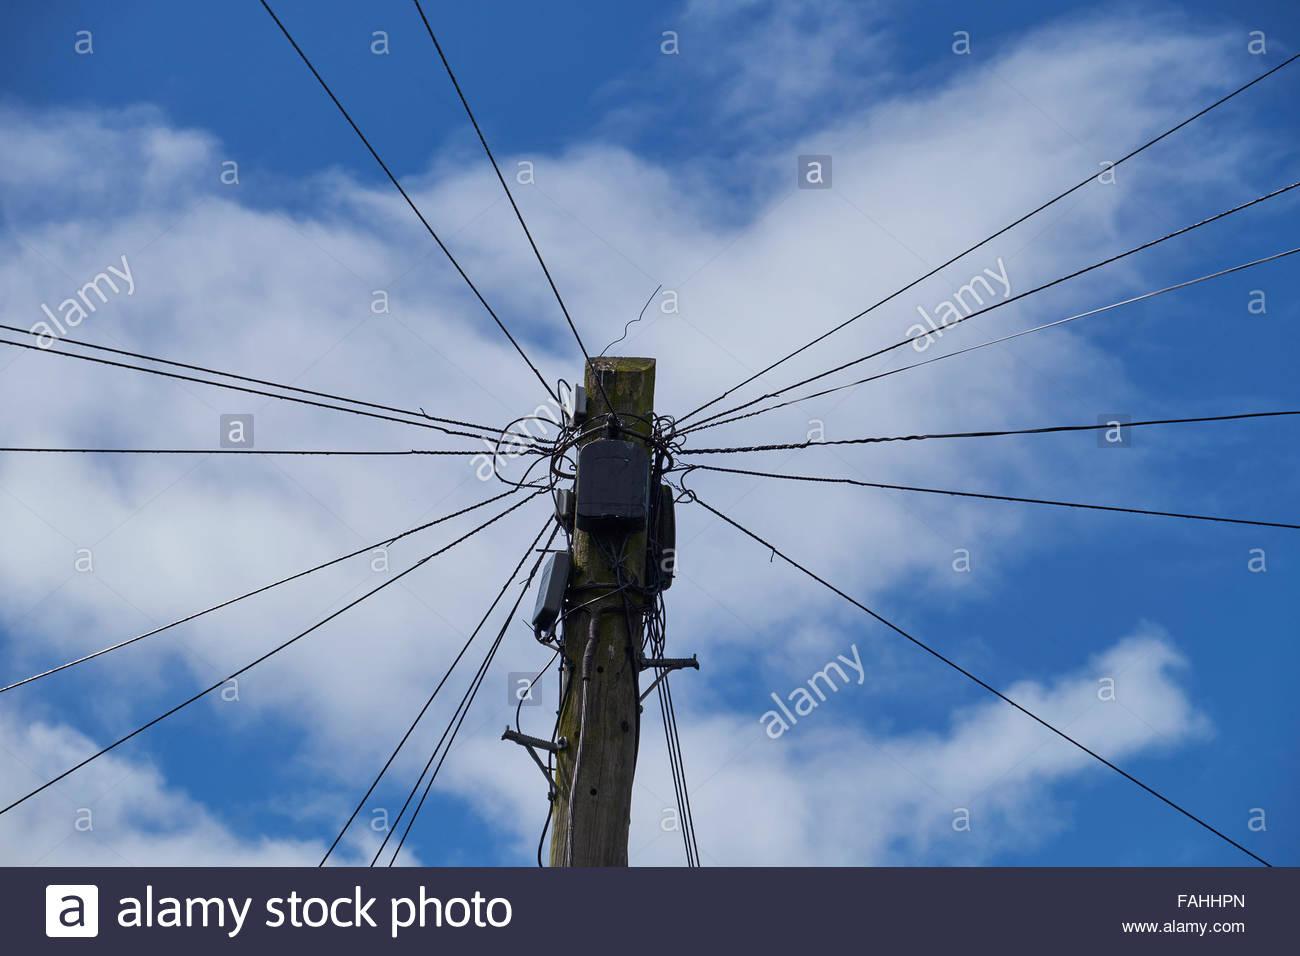 Swainby Telegraph poleStock Photo